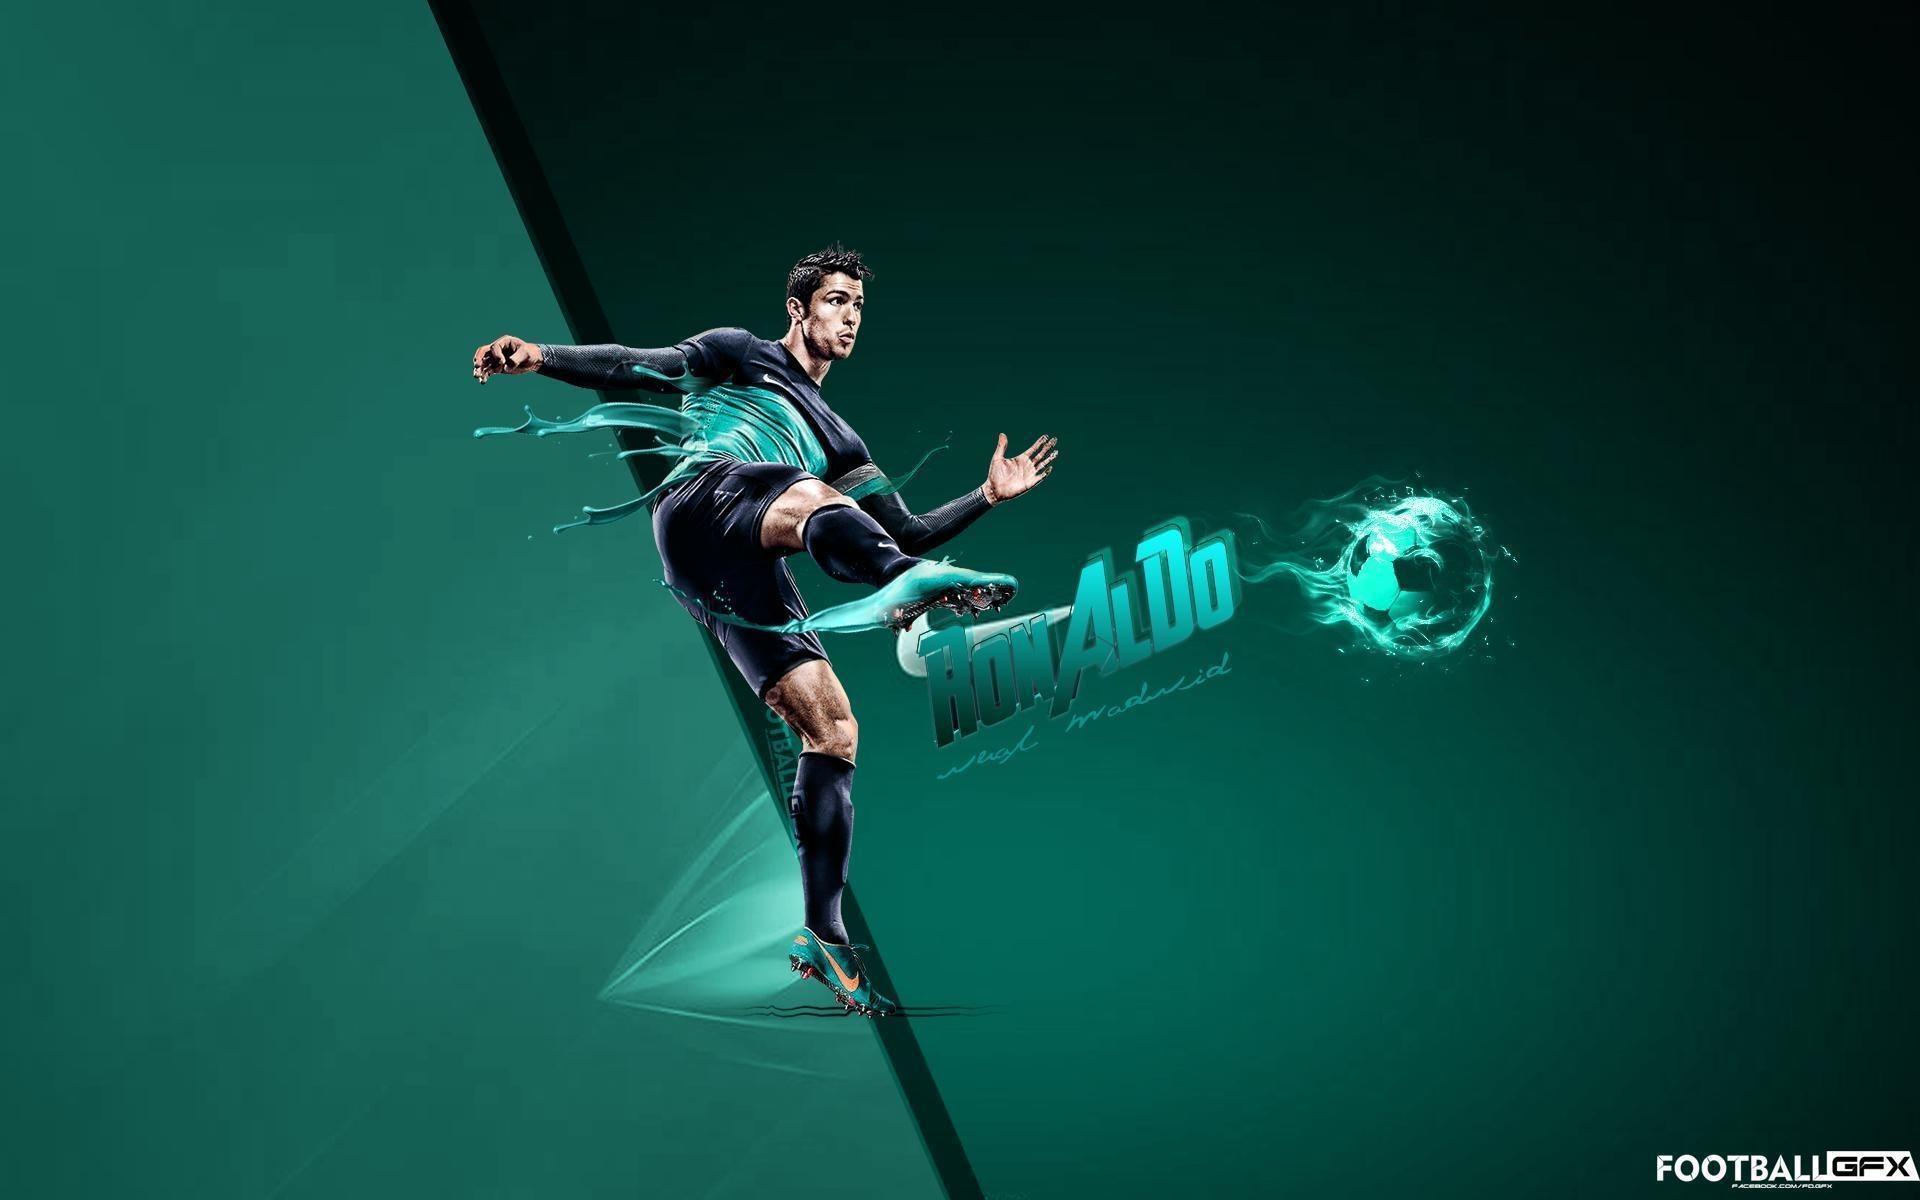 buy popular 6ca45 53e5d 1920x1200 1920x1200 Cristiano Ronaldo HD Desktop Wallpapers for Widescreen,  High .